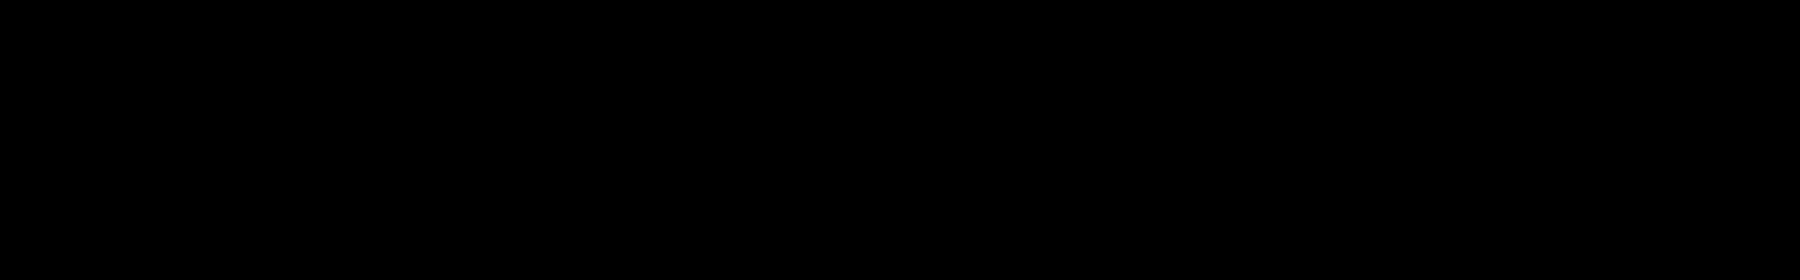 Neo Acid audio waveform